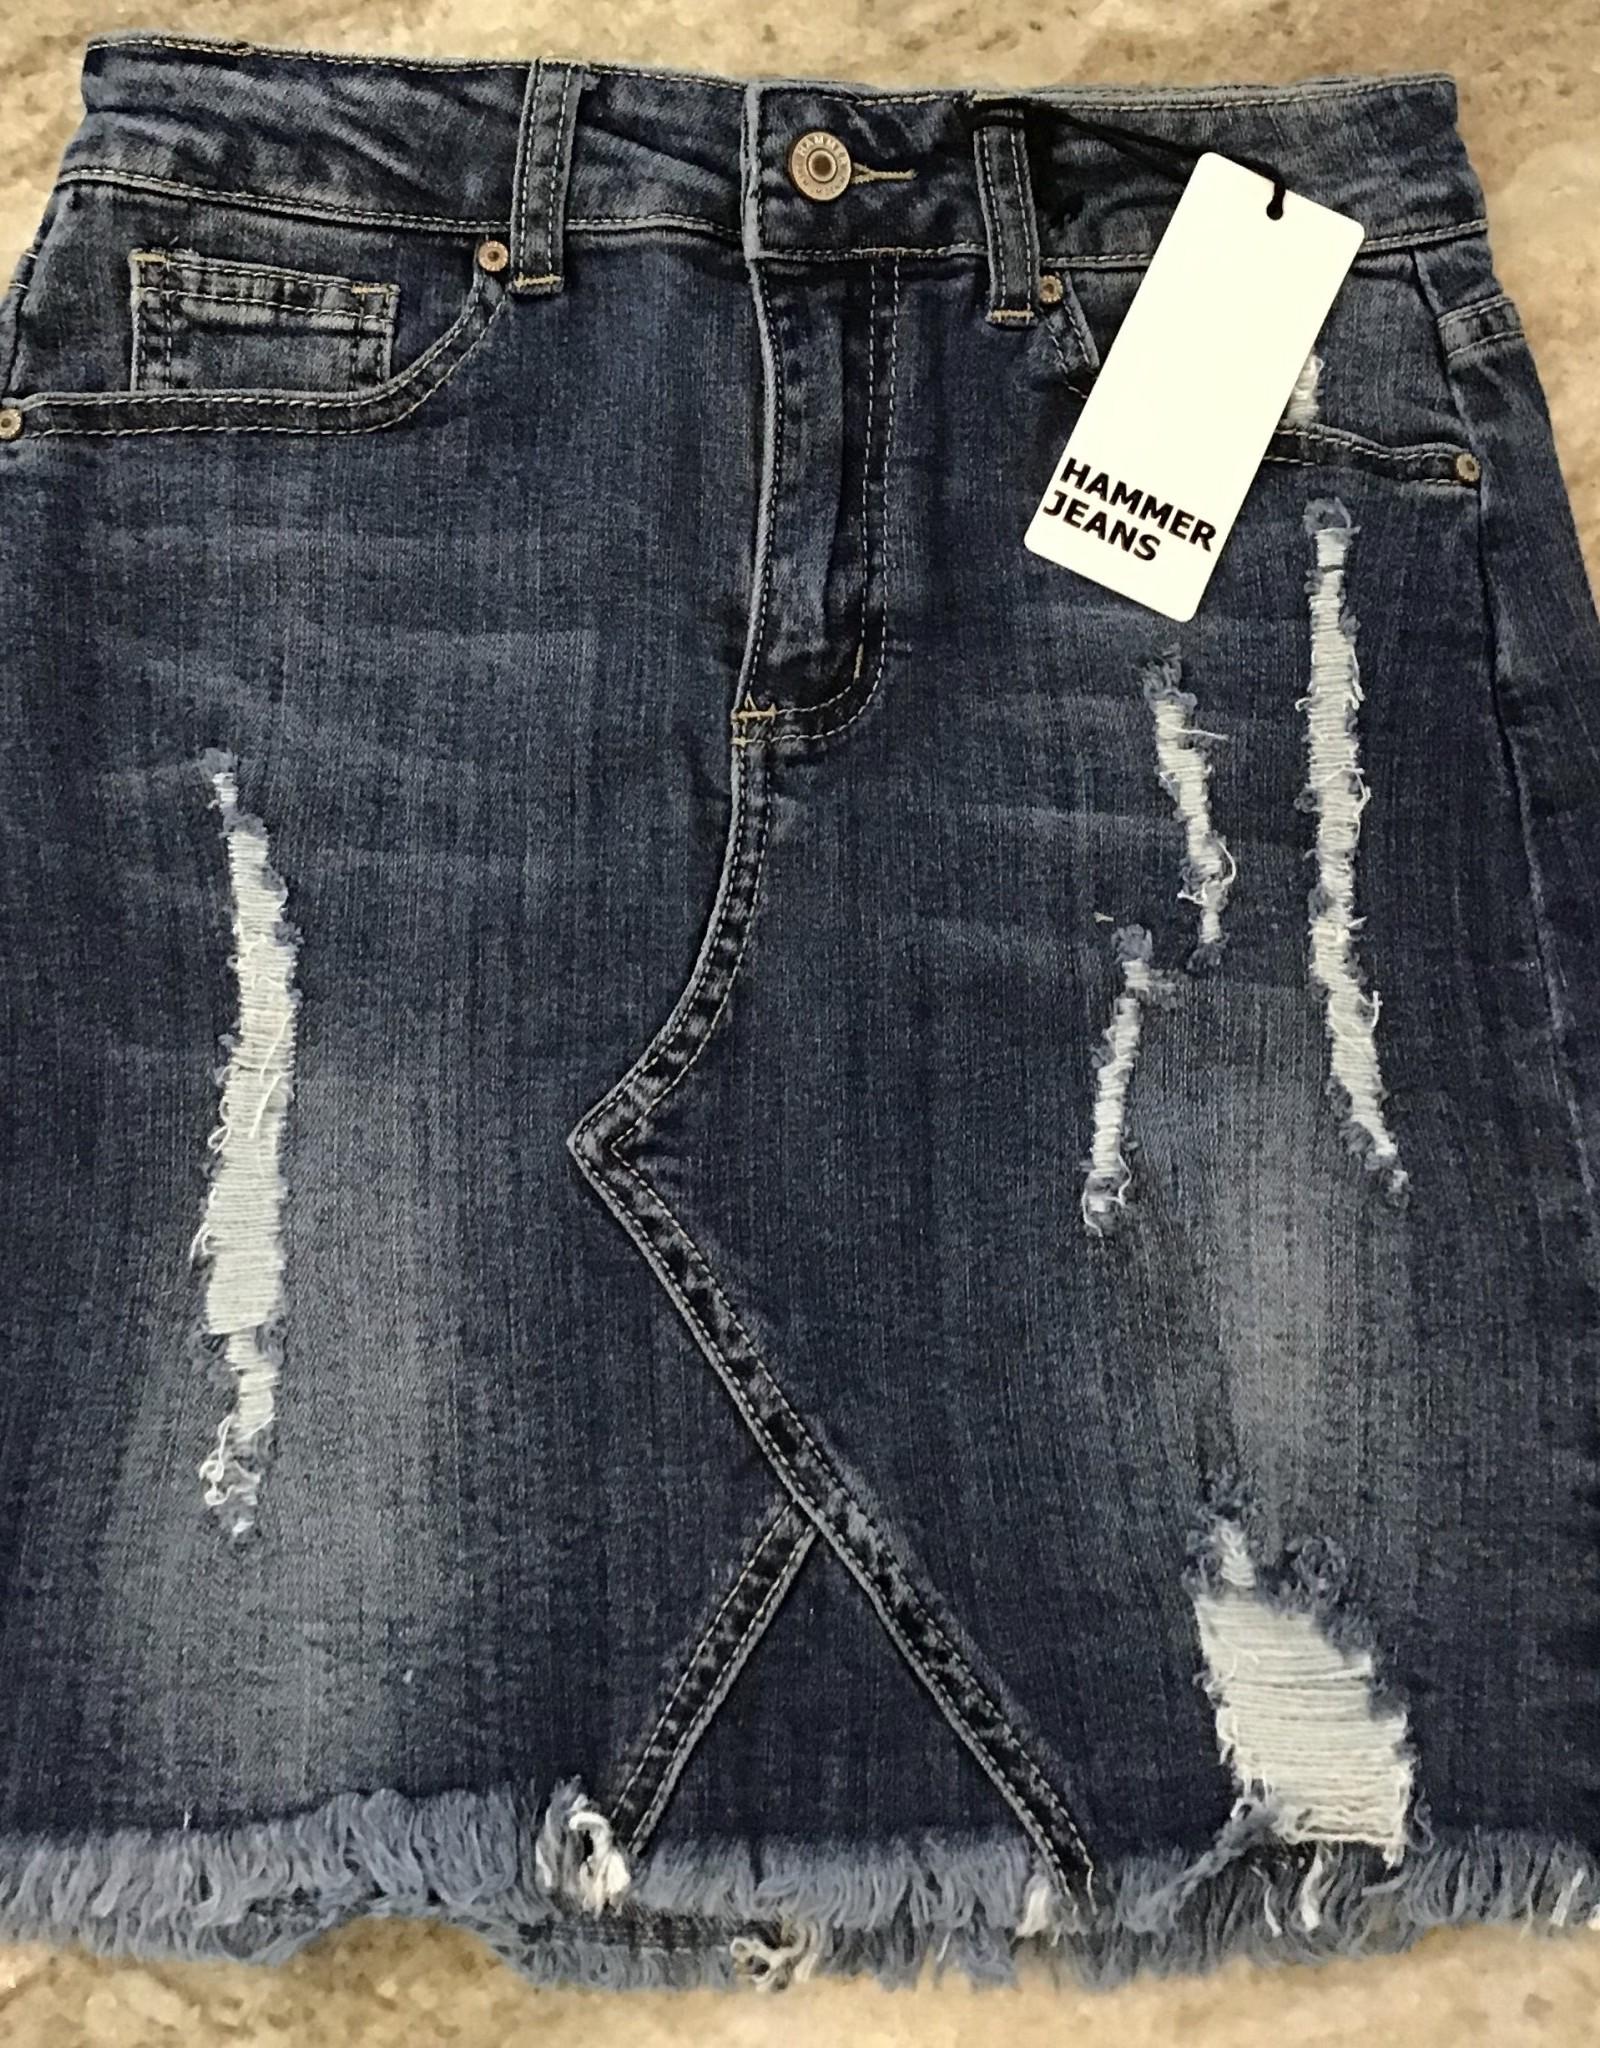 Hammer Collection Distressed Denim Skirt with Raw Hem